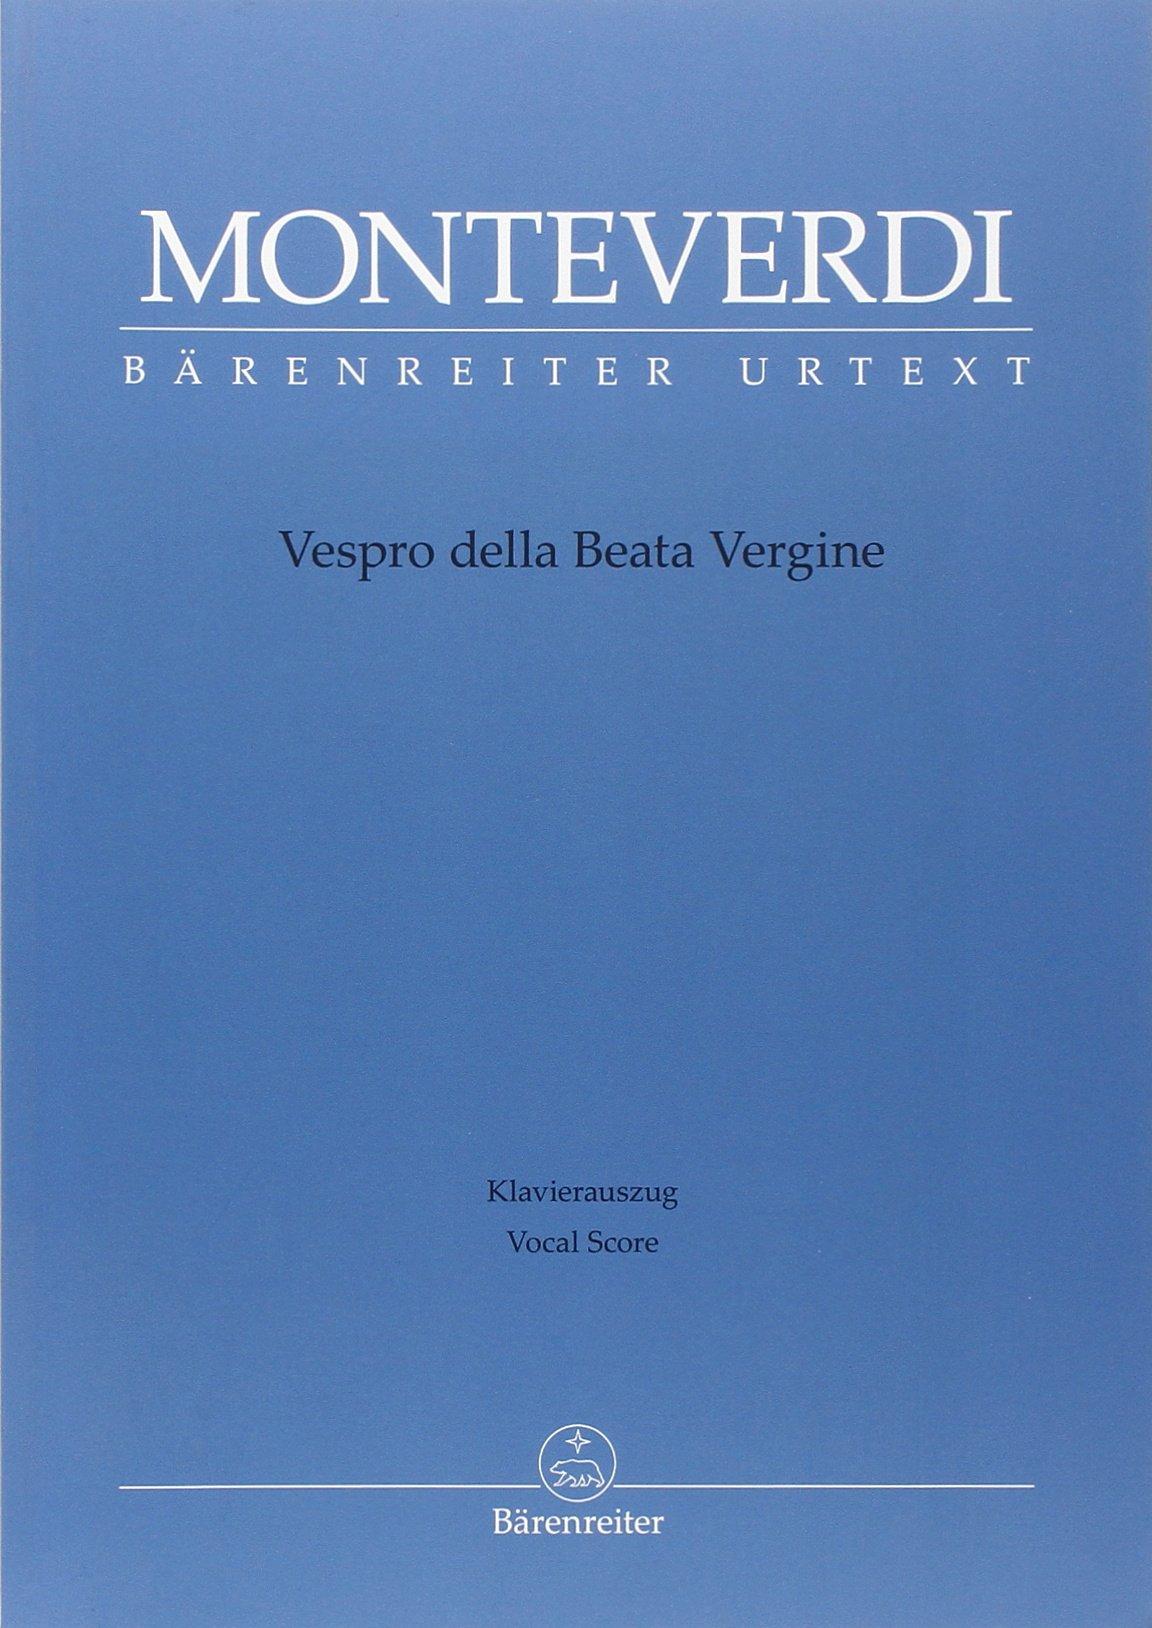 Vespro della Beata Vergine: Klavierauszug (Allemand) Broché – 1 mars 2013 Claudio Monteverdi Baerenreiter-Verlag B00B4WHL4G Musikalien